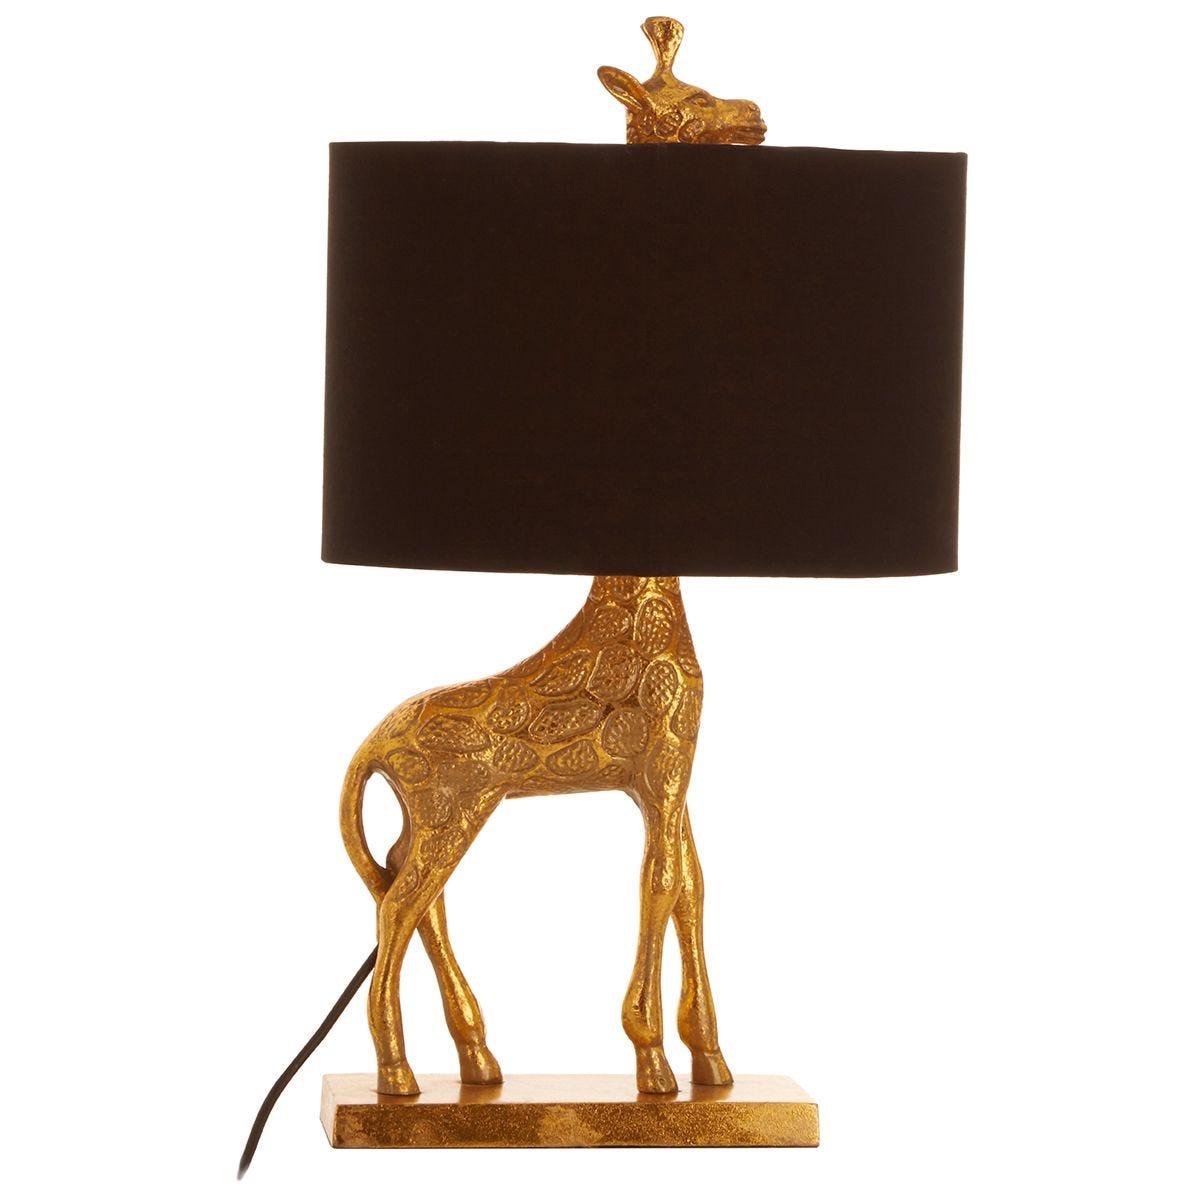 Premier Housewares Sika Giraffe Table Lamp - Black/Gold Finish